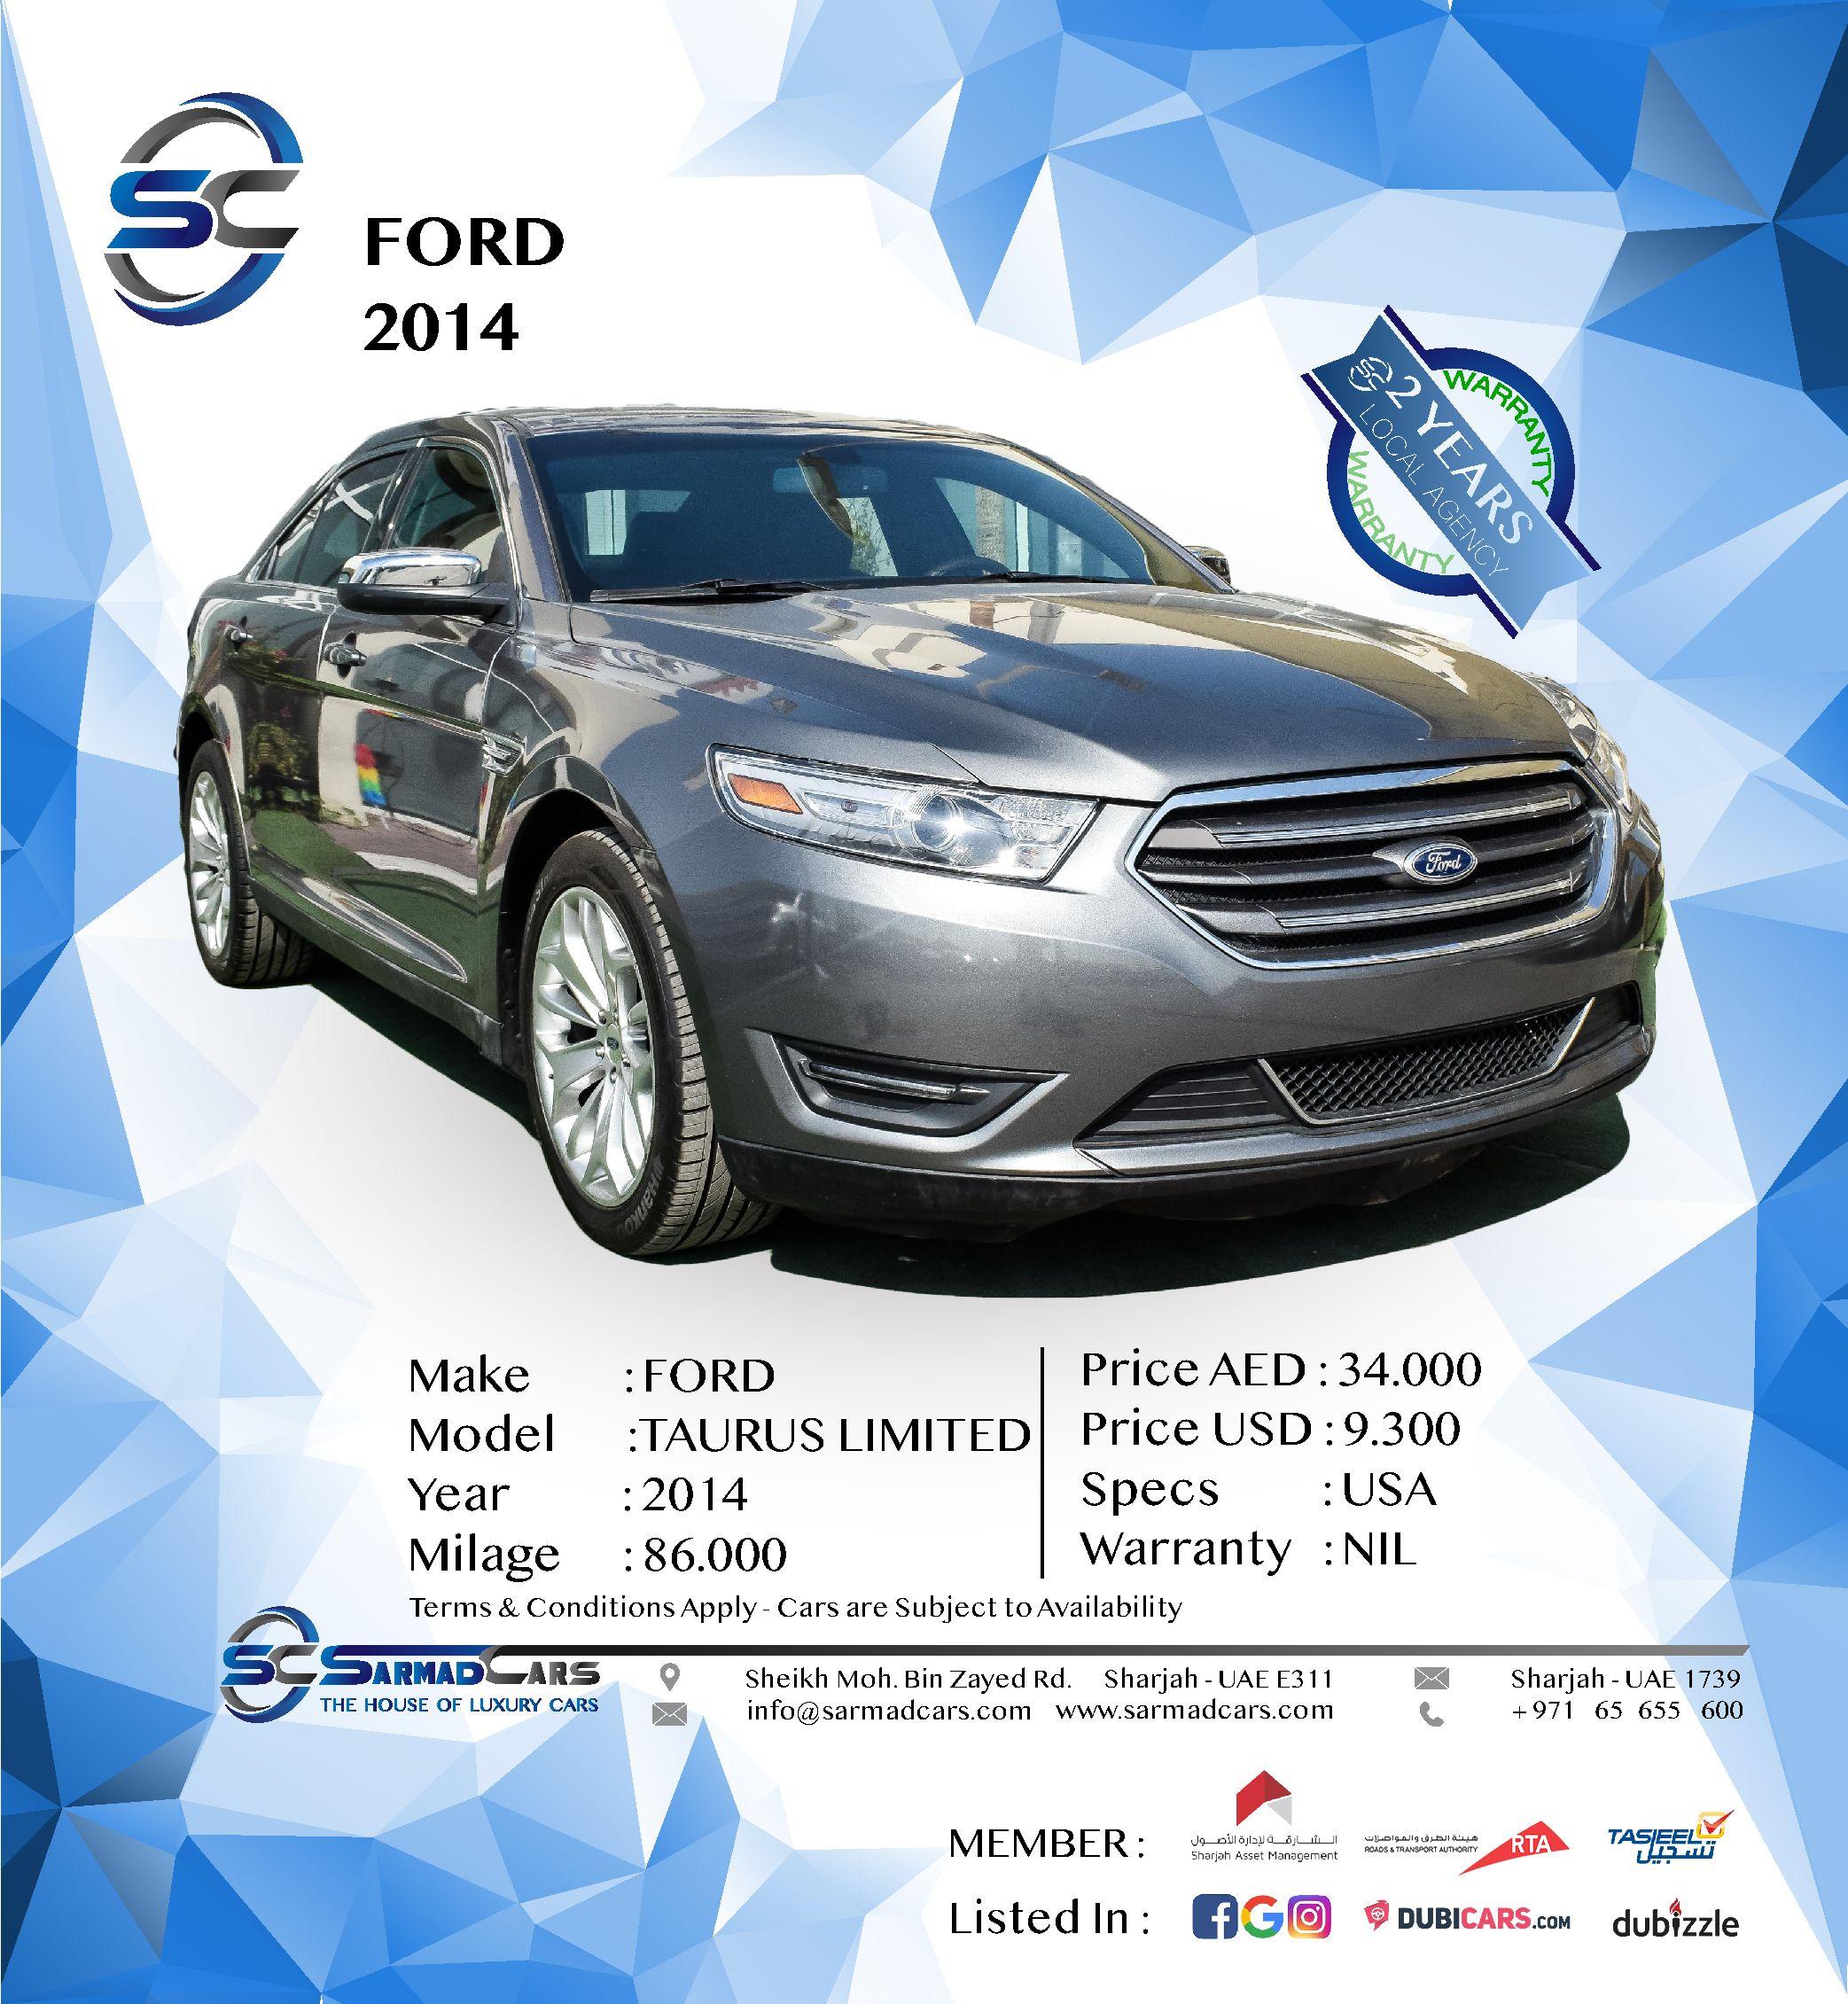 34 000aed Sports Car Used Cars Suv Car